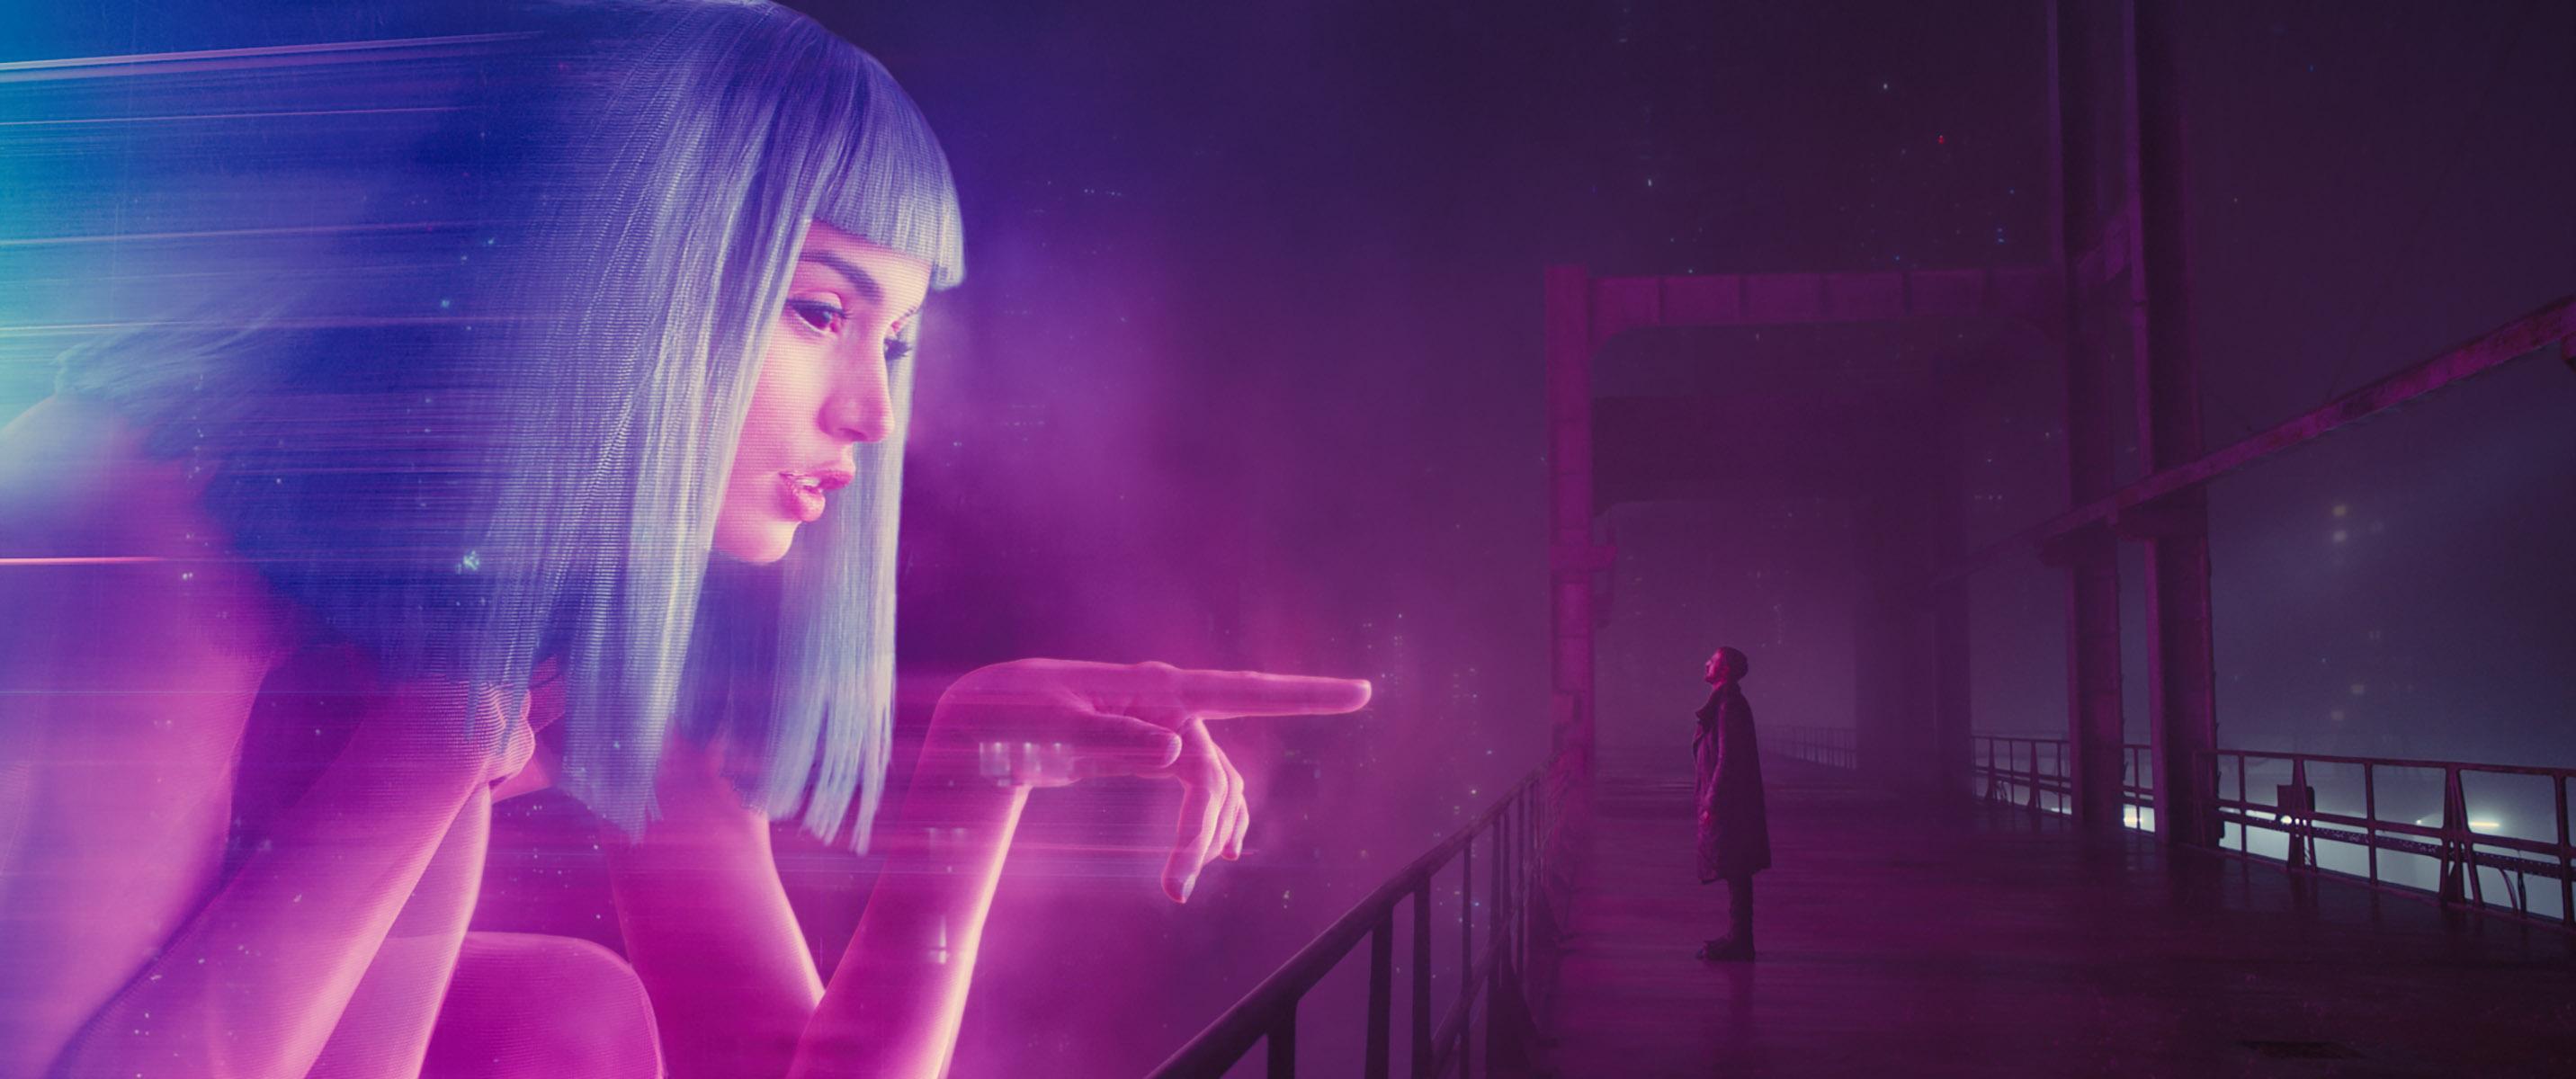 Blade Runner 2049 spoilers: let's talk about the Ryan Gosling twist